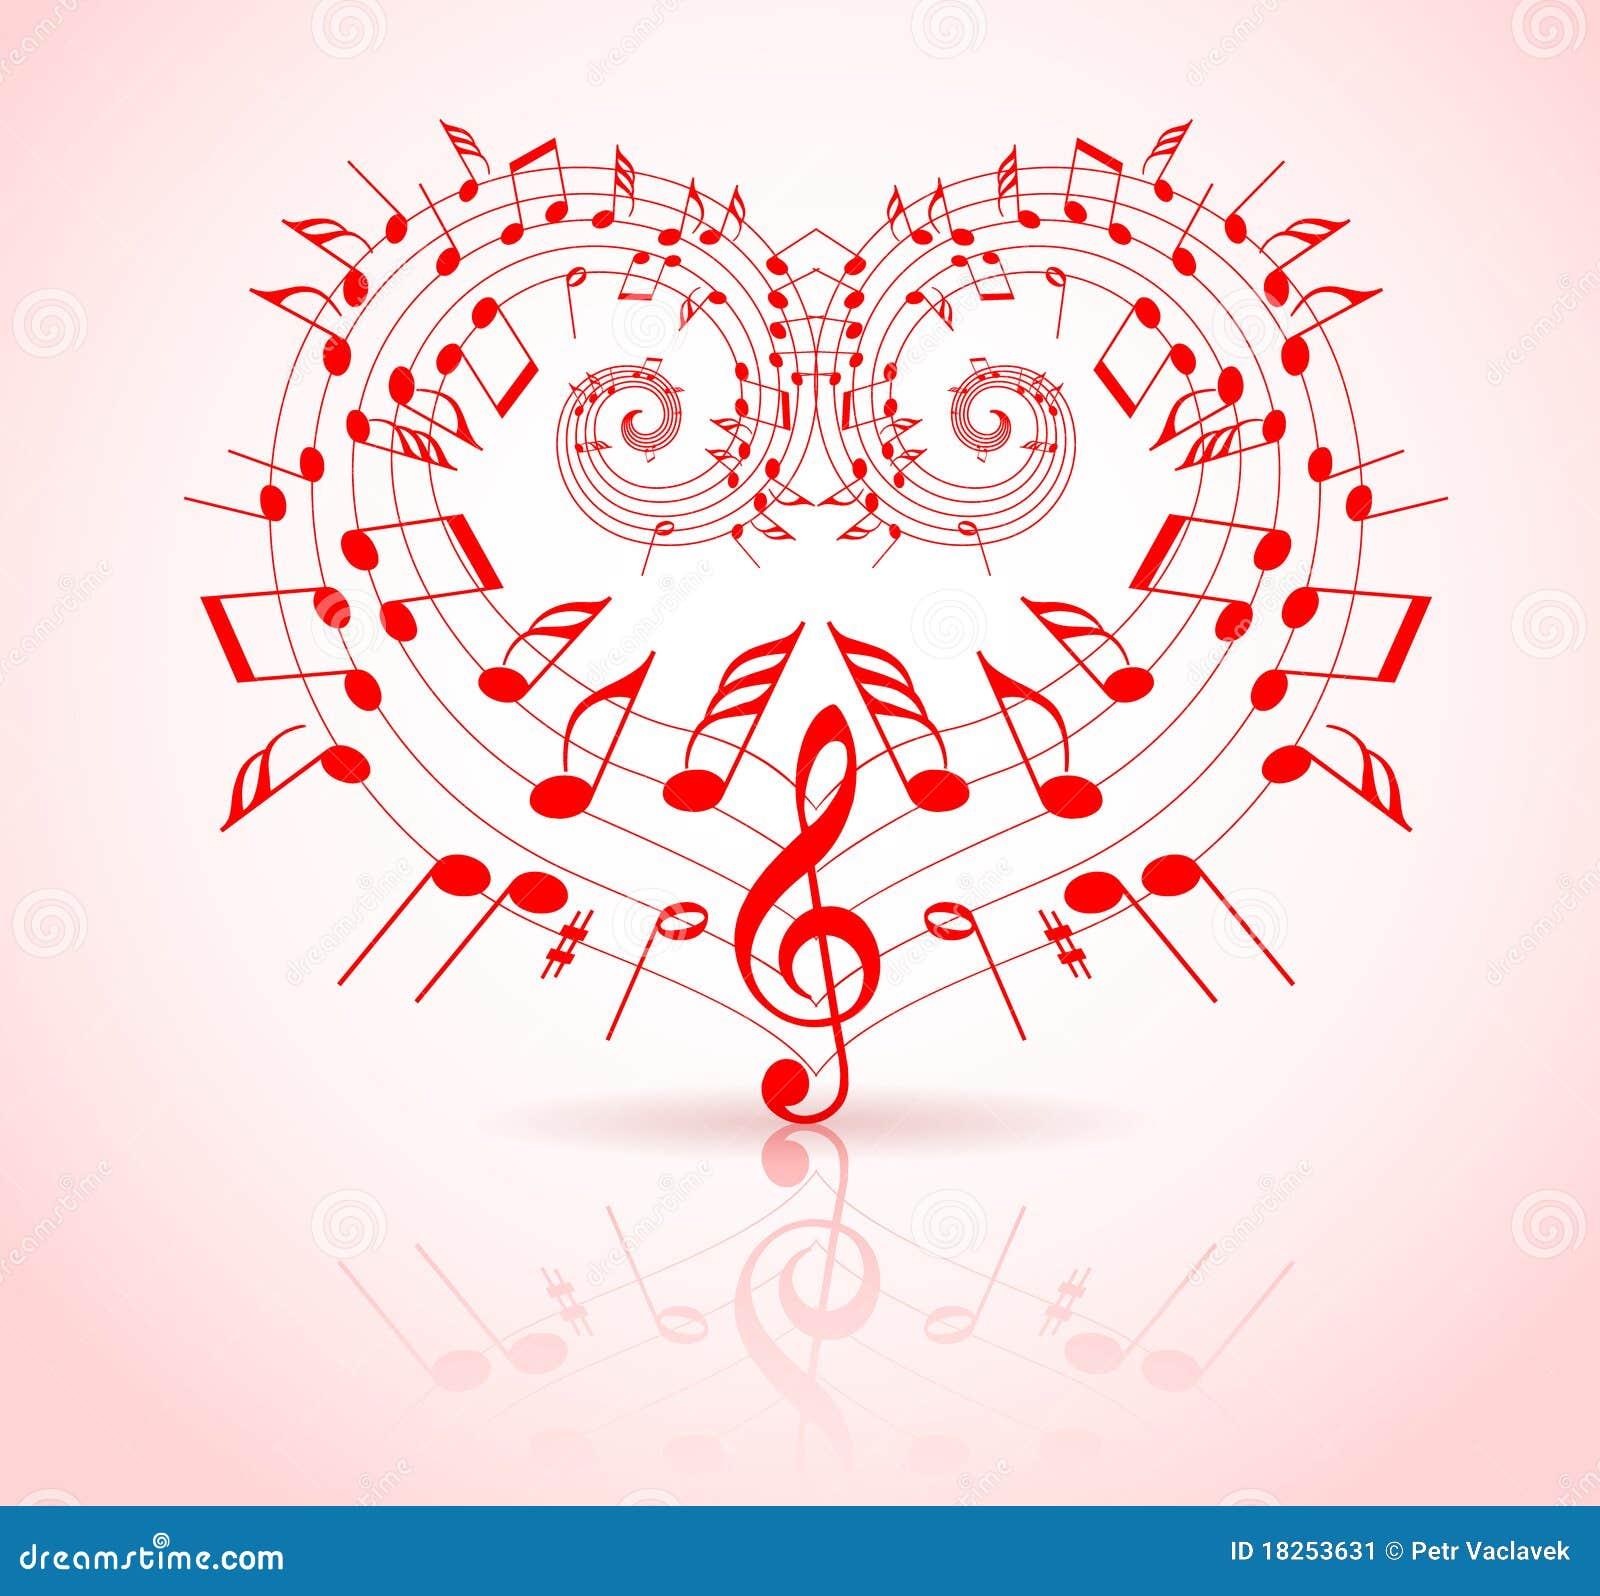 valentines day music theme stock illustration